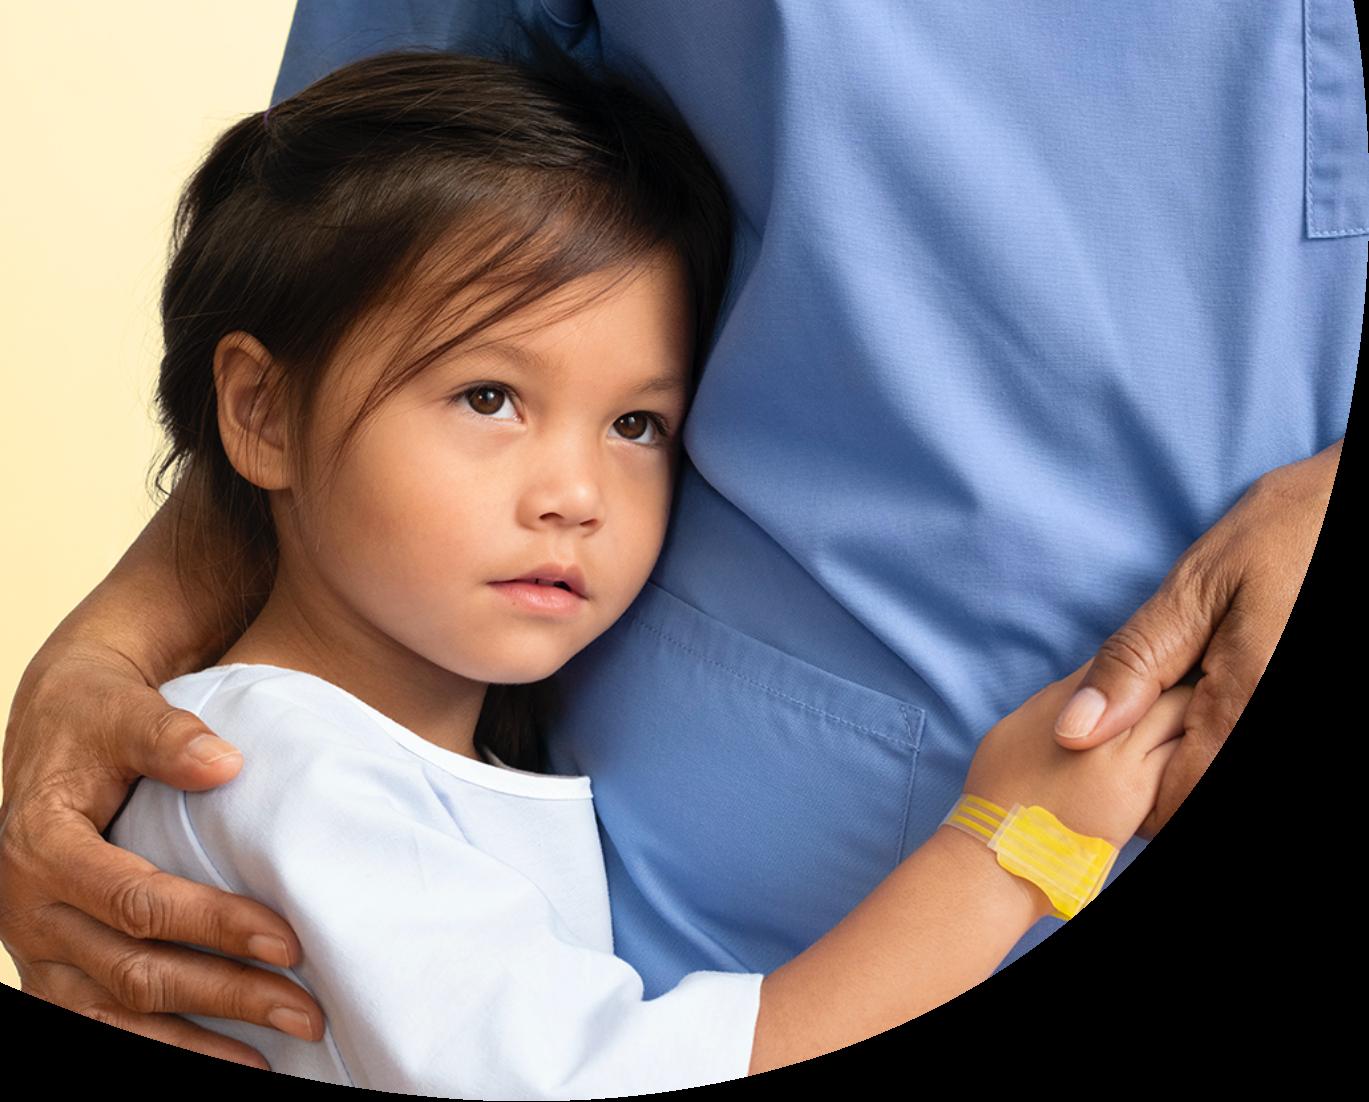 Child hugging provider